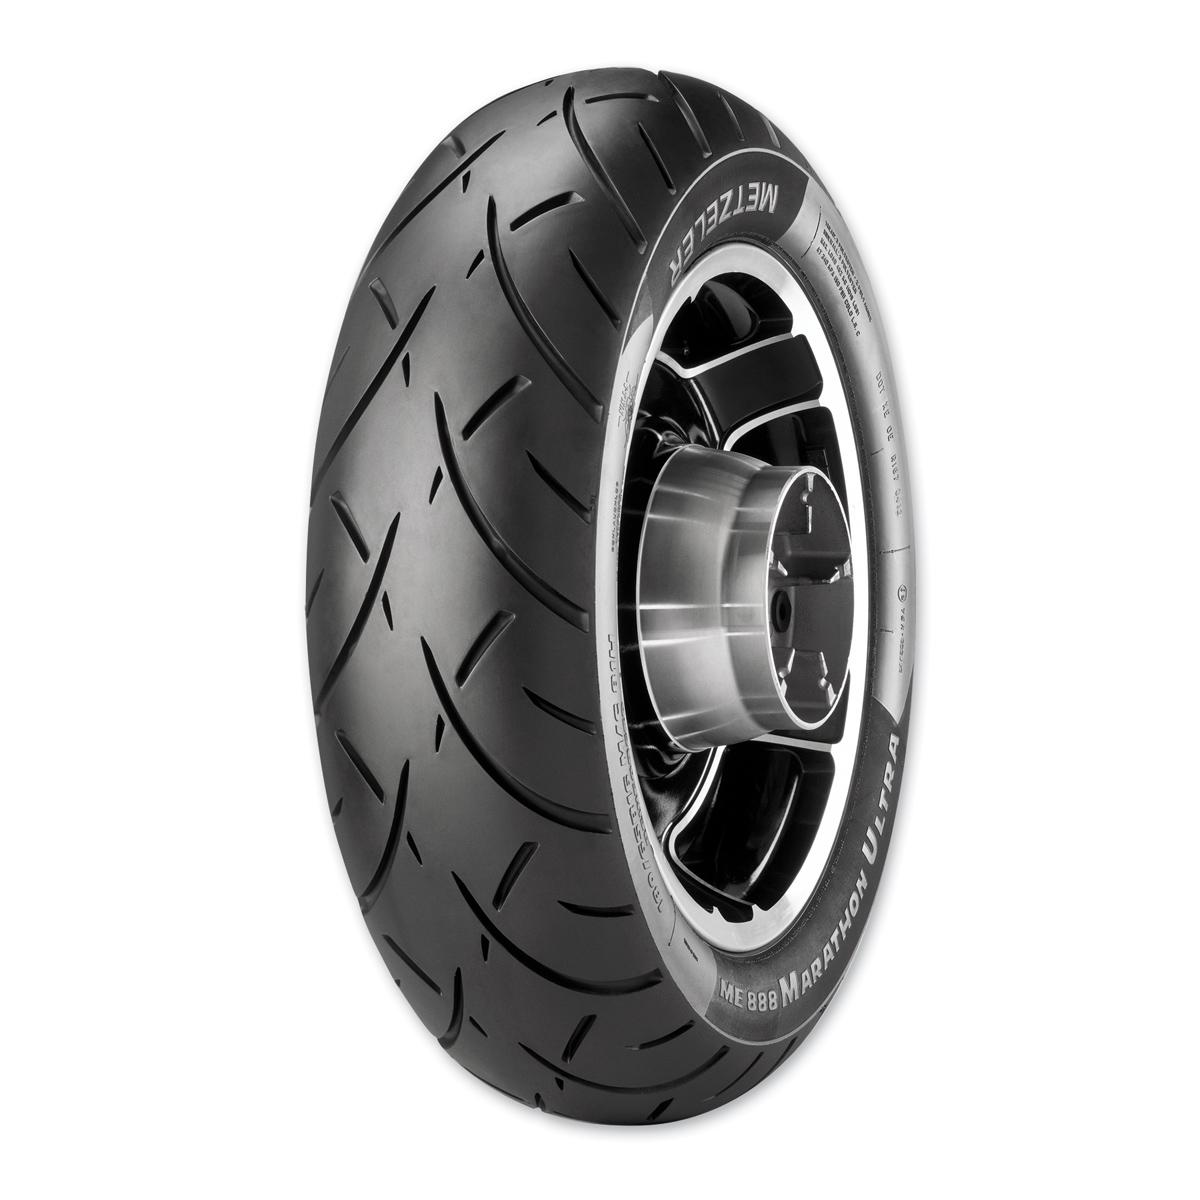 Metzeler ME888 Marathon Ultra 200/60R16 Rear Tire